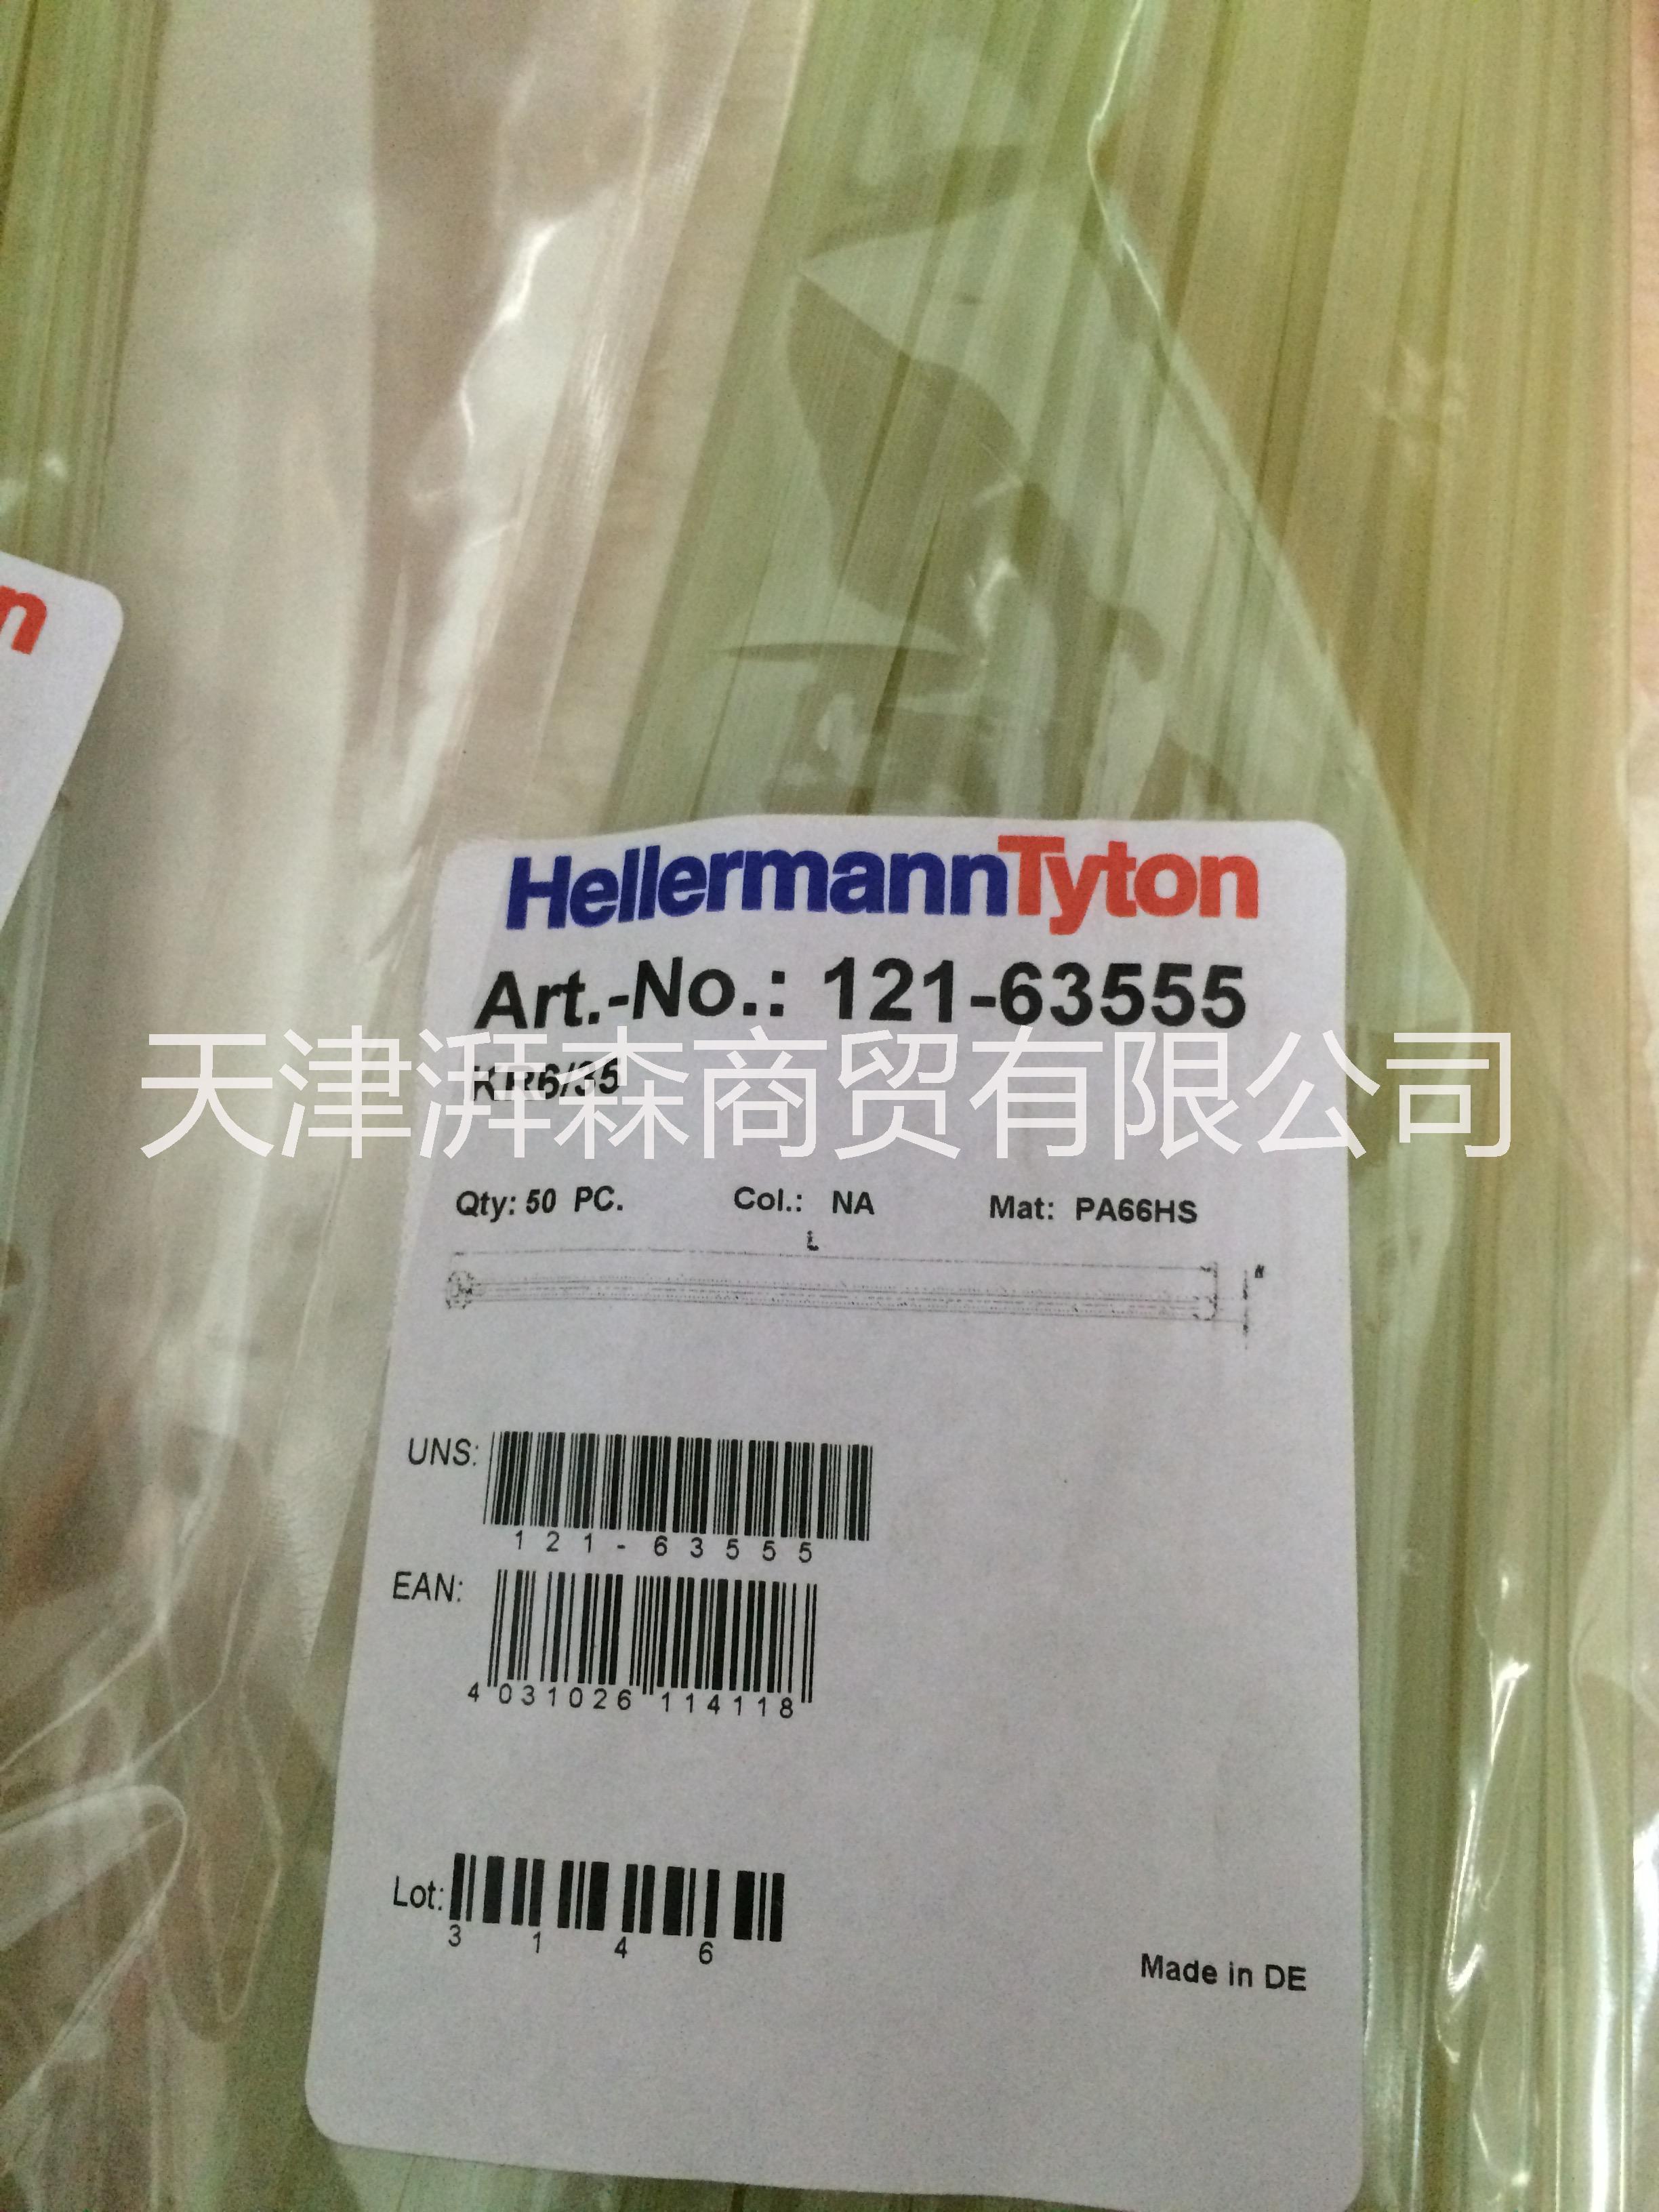 HellermannTyton 121-63555 KR6/35 扎带 现货 天津湃森商贸有限公司